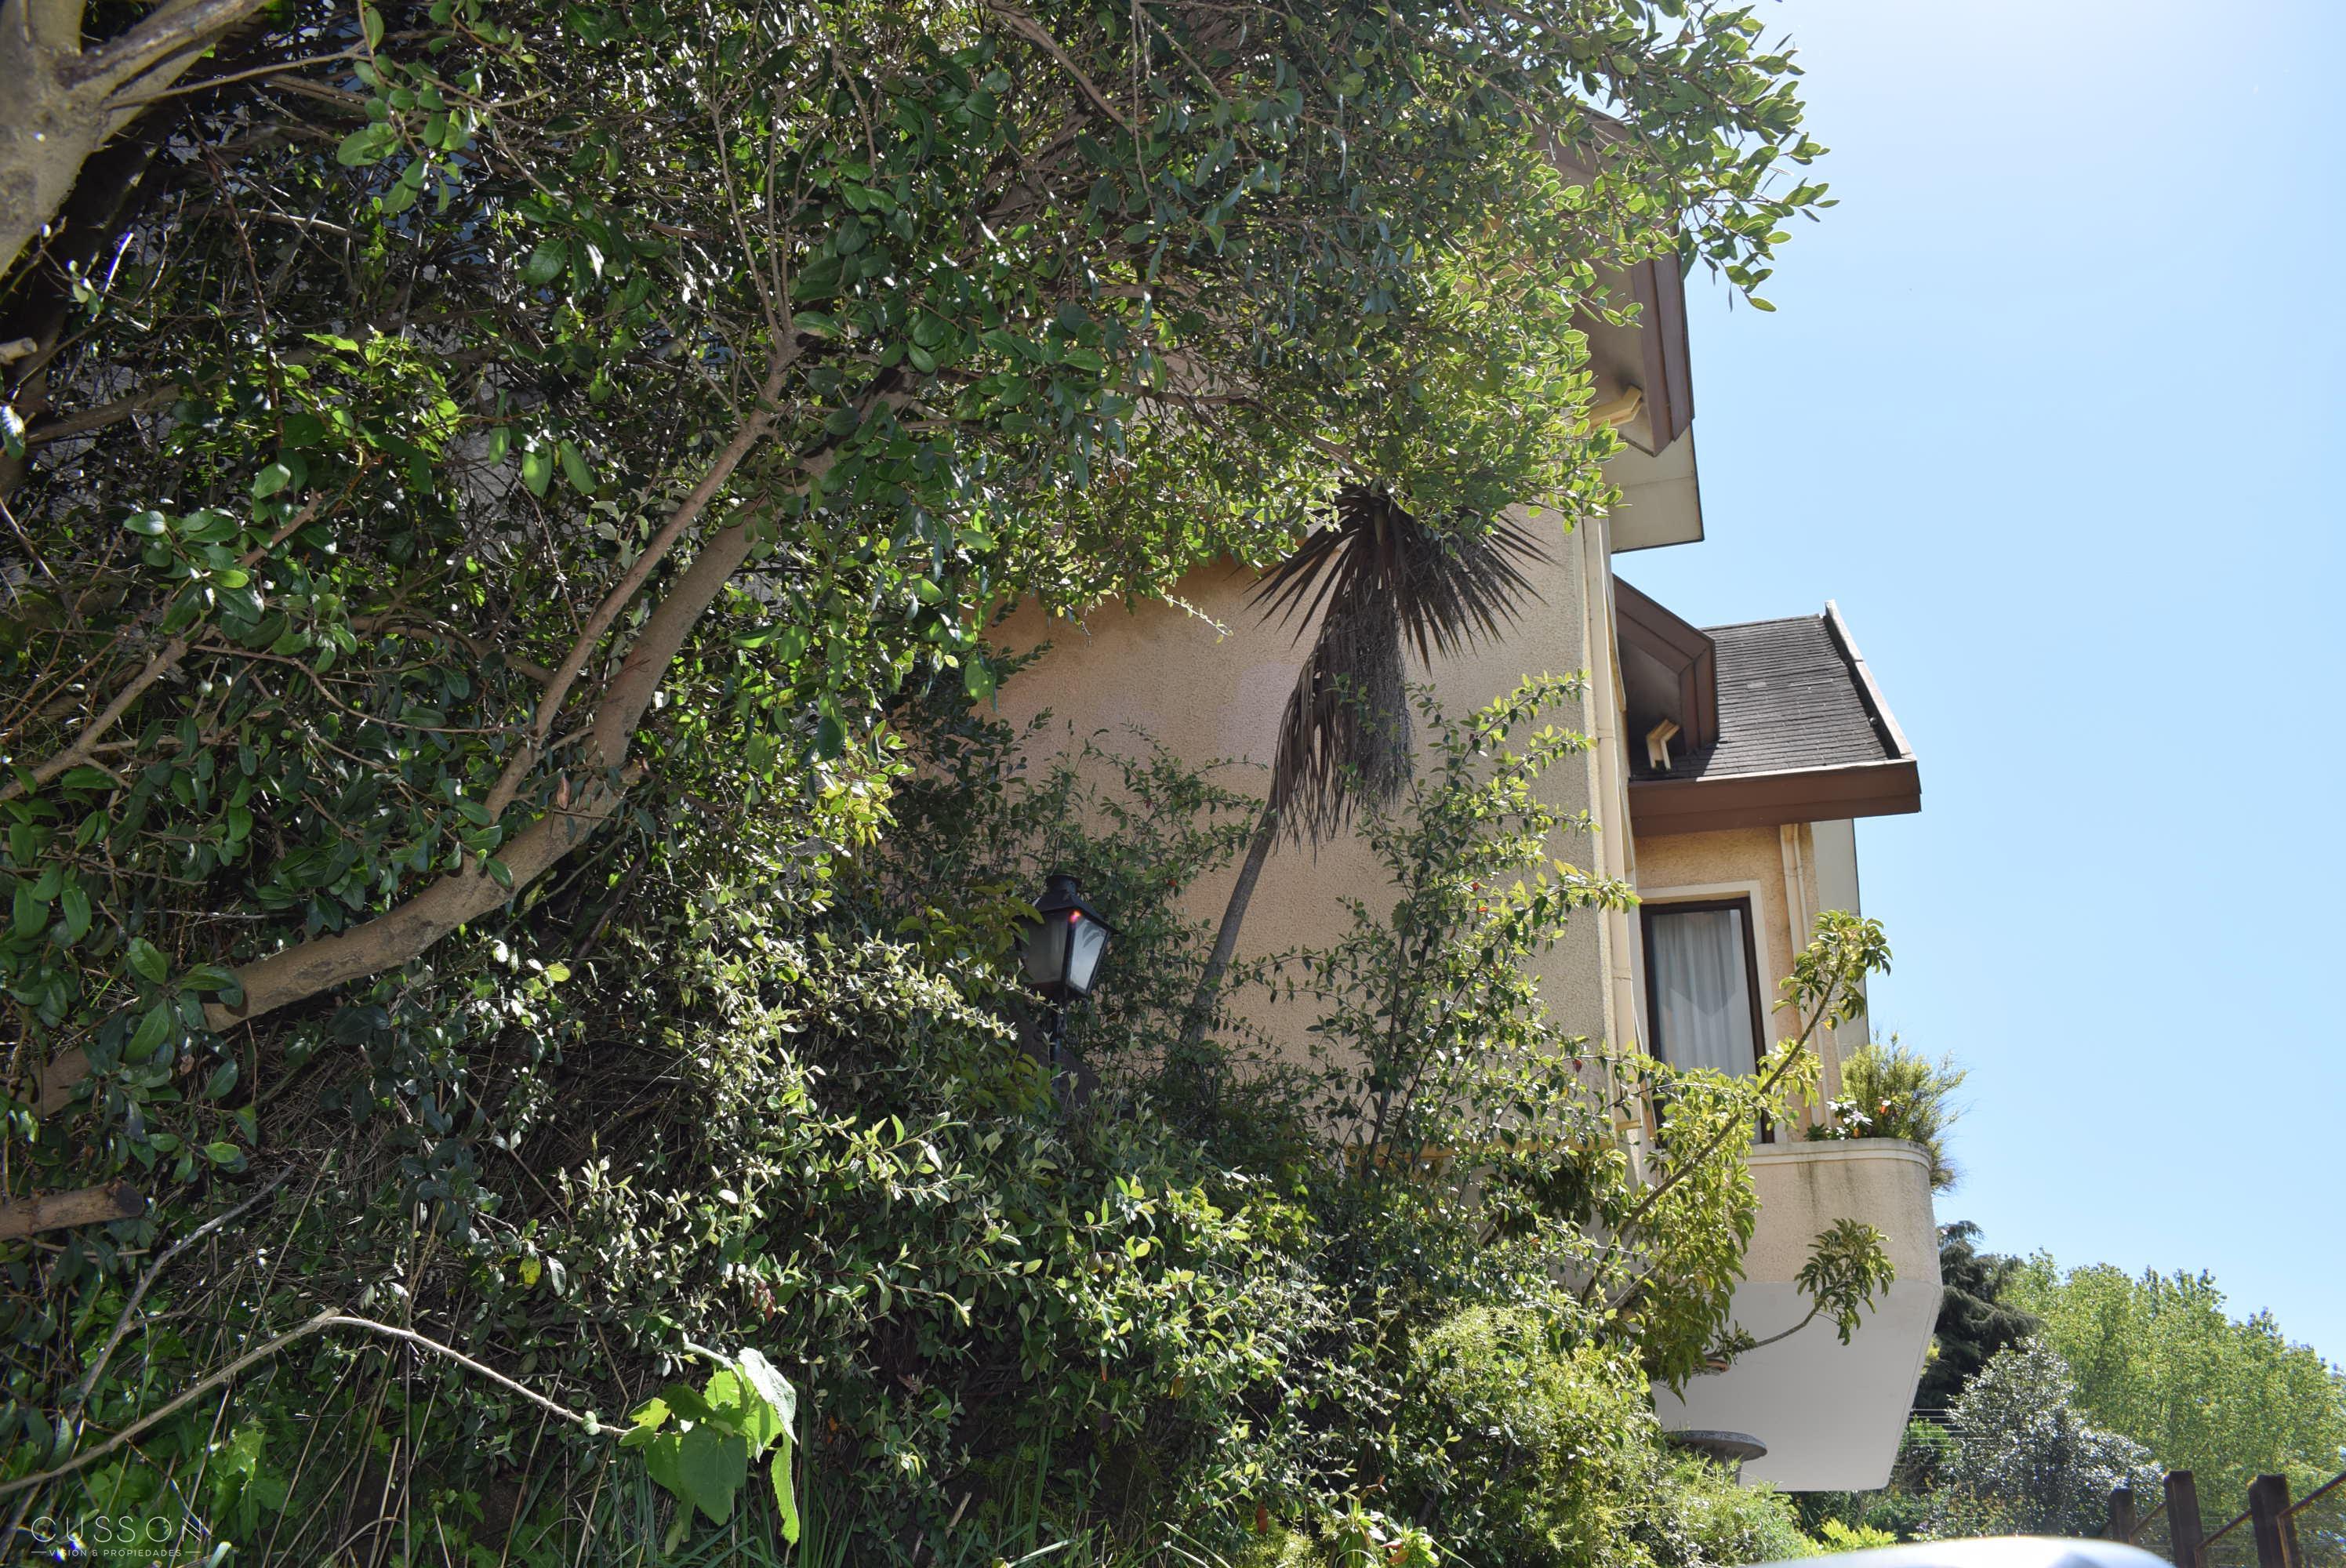 Venta Casa Las Lomas de San Andres 400/625m2 5D5B1SE4EST